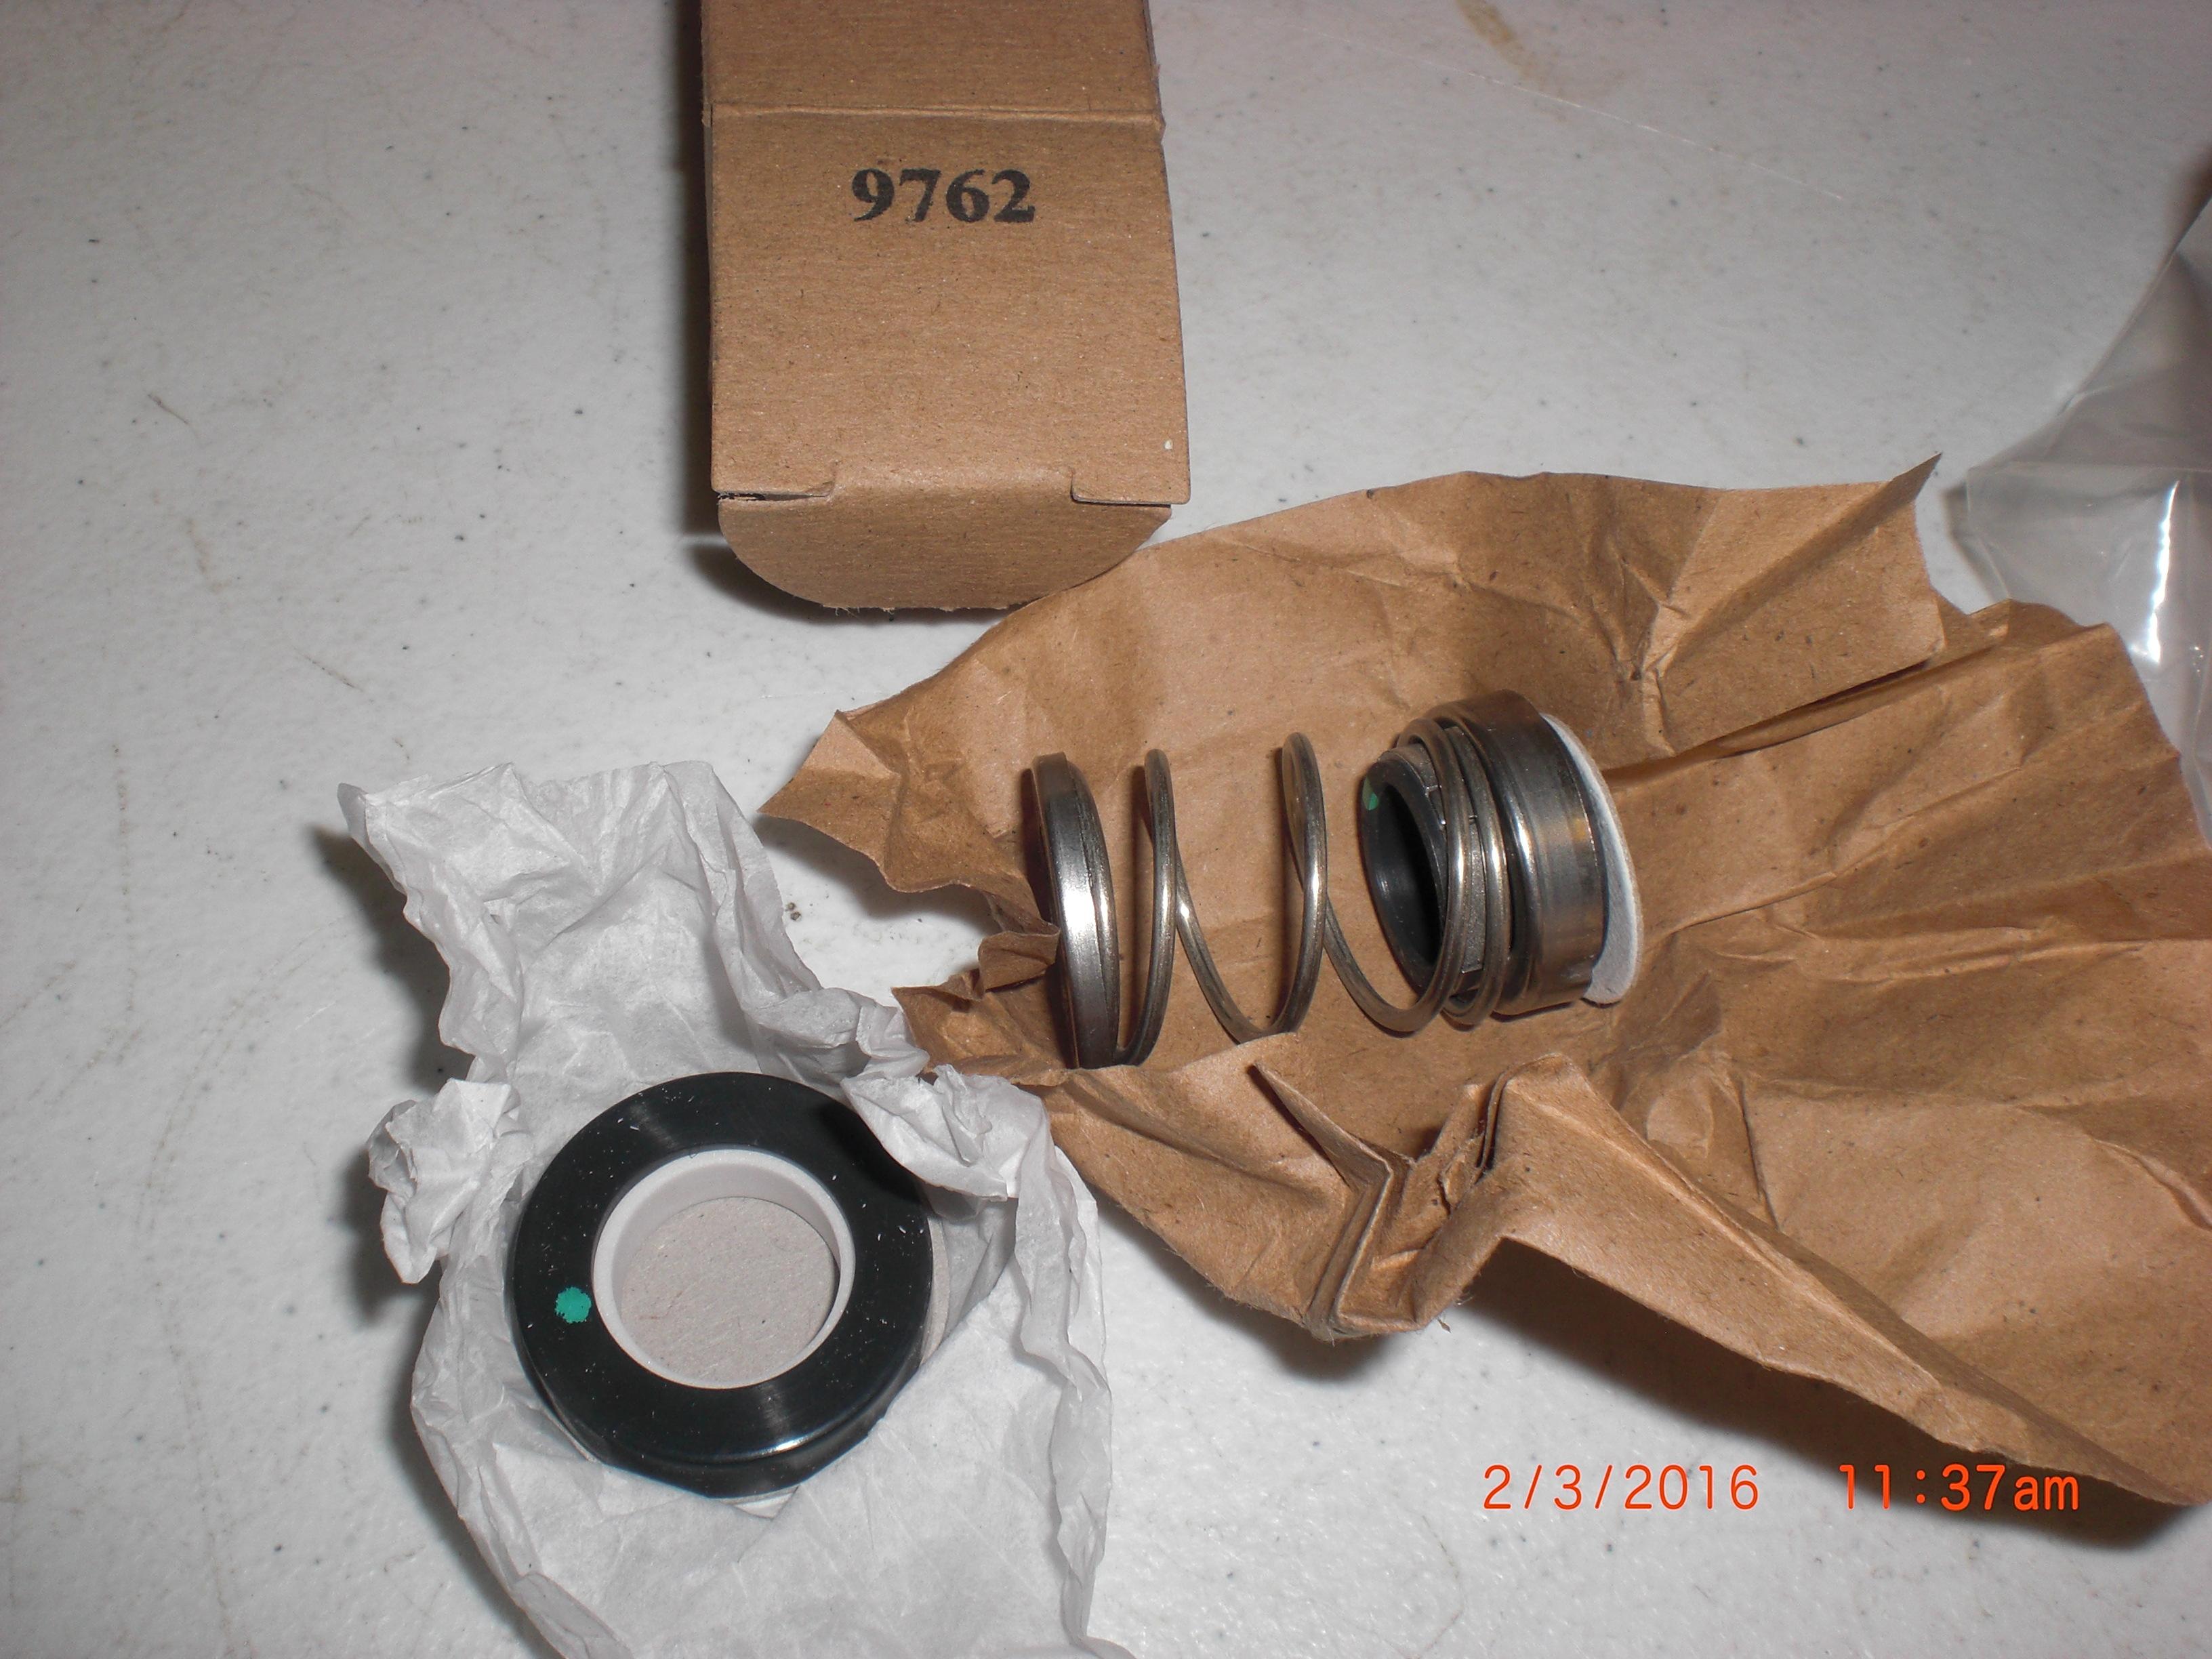 Seal Pump Agents  9762-1 shaft Seal 0.625 Vition Pump-Mechanical